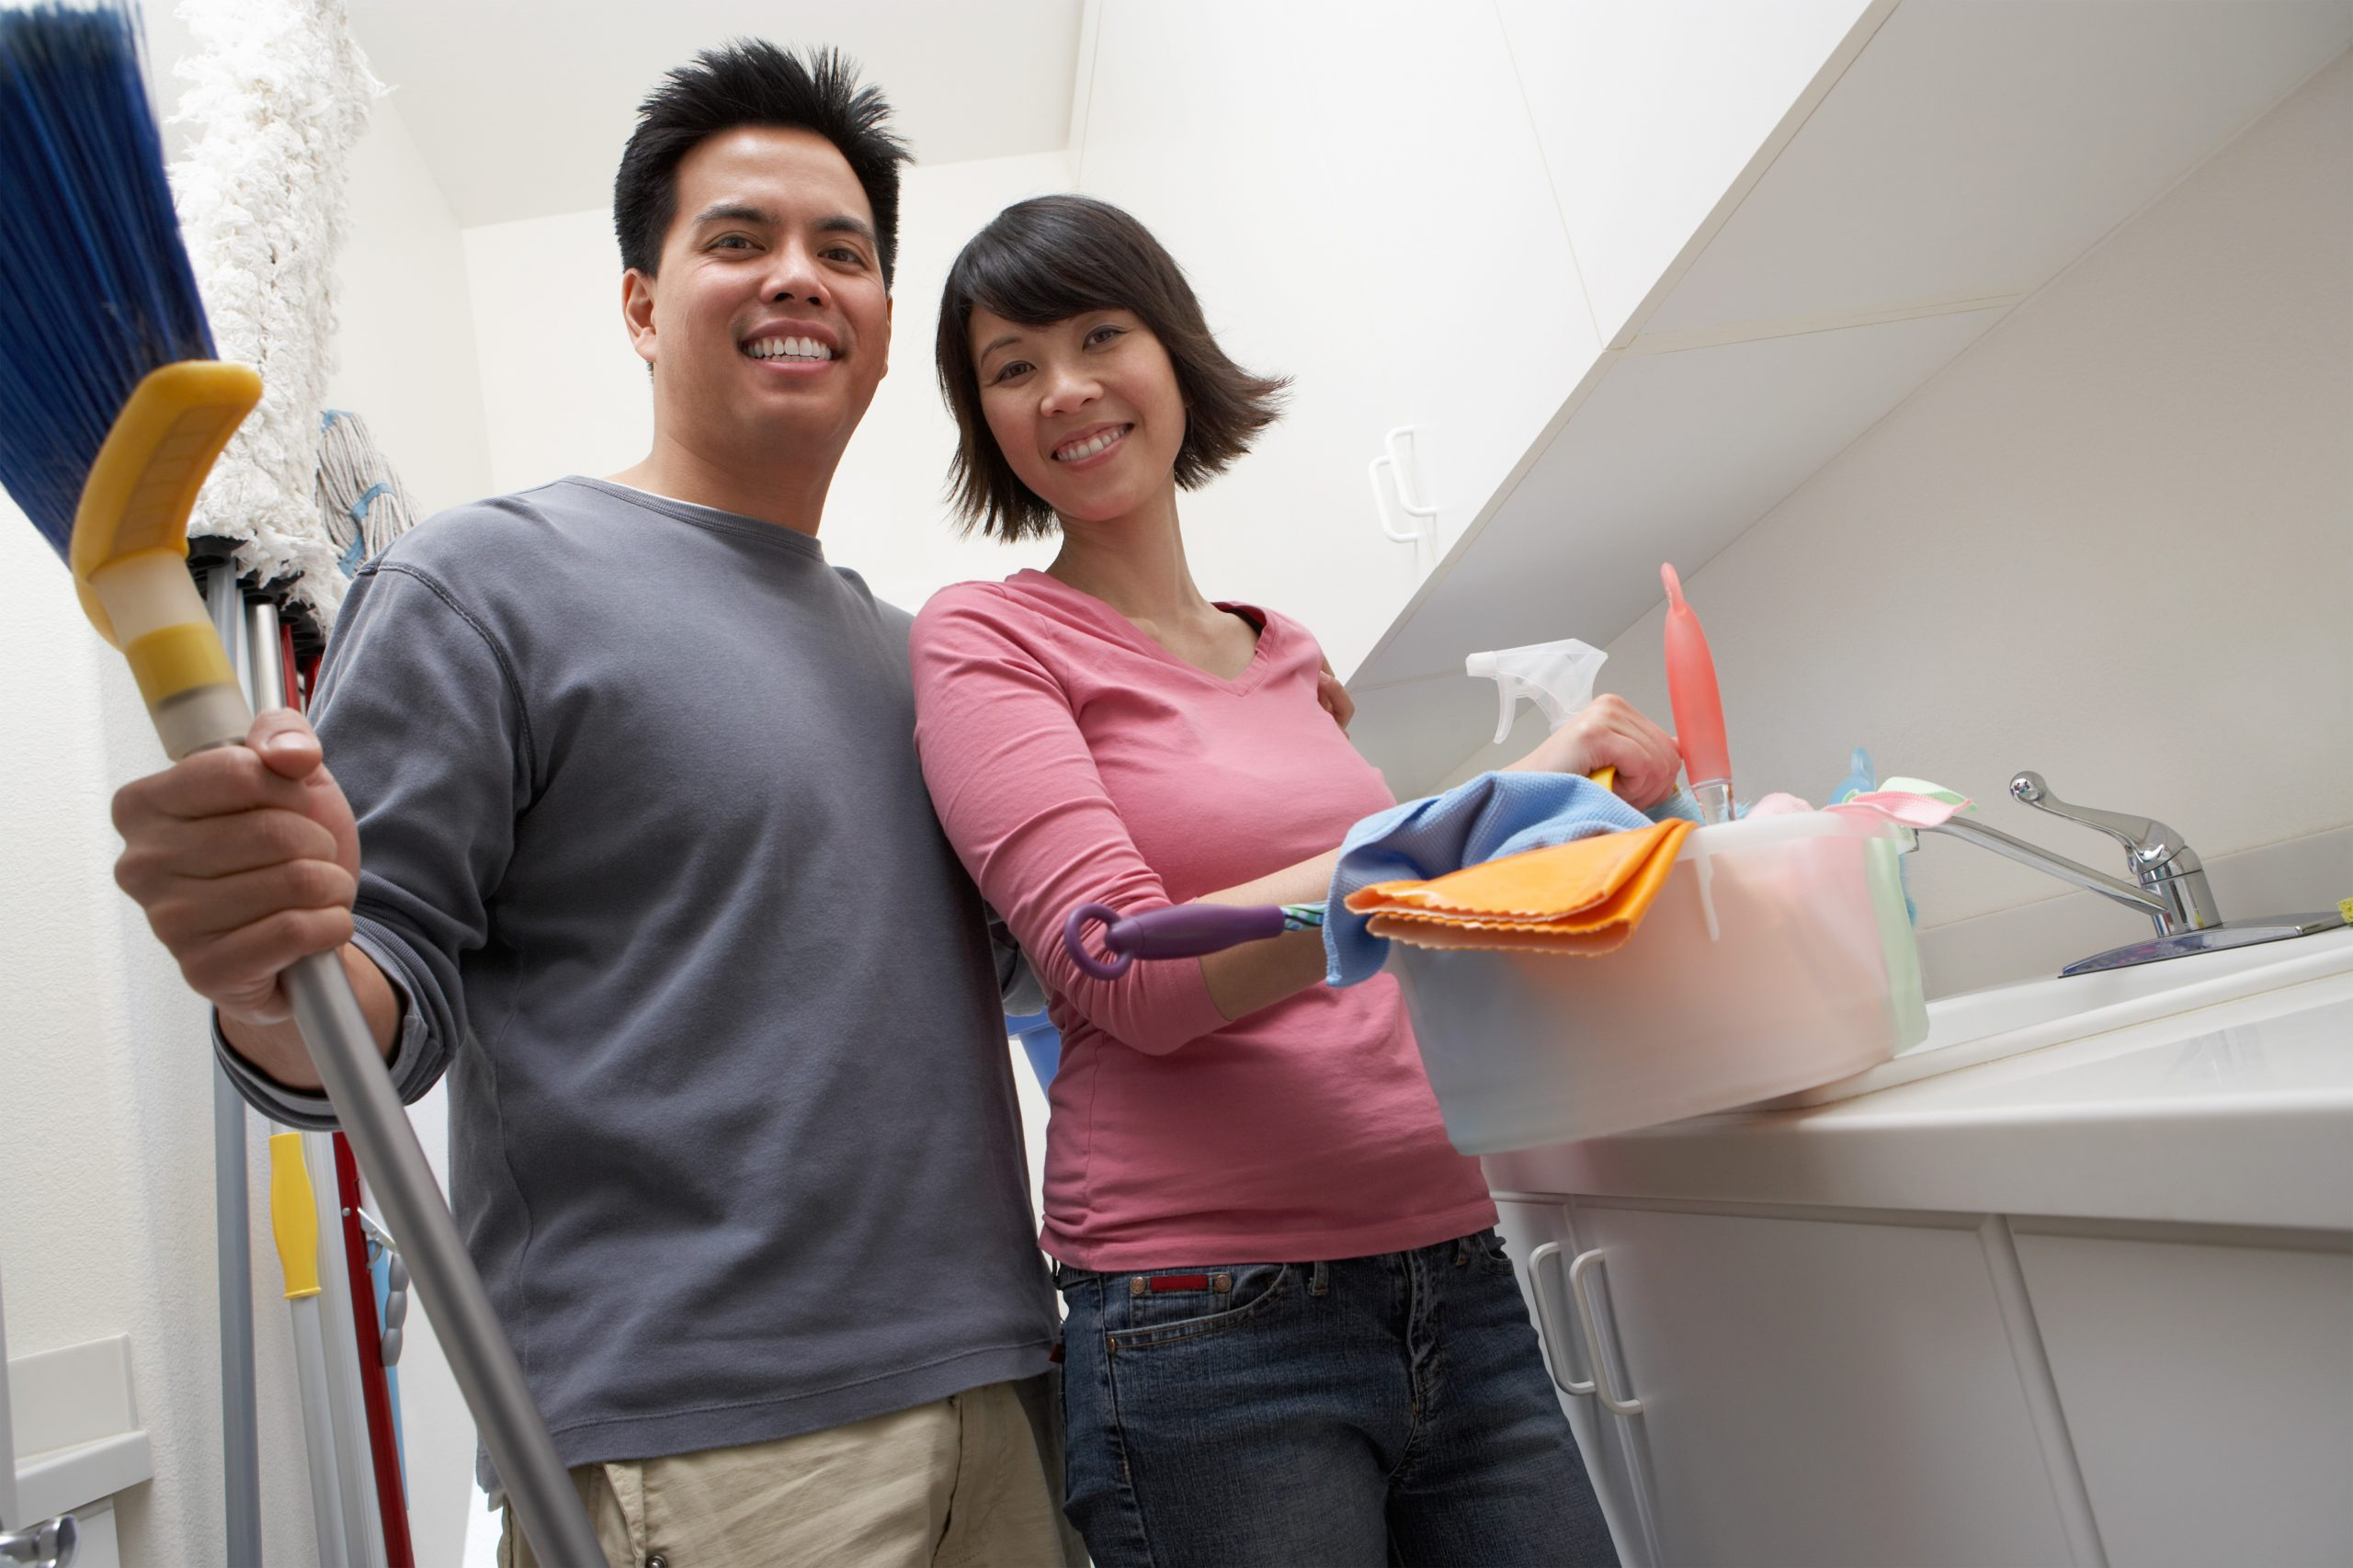 How To Clean Epoxy Floor In 8 Easy Practical Steps